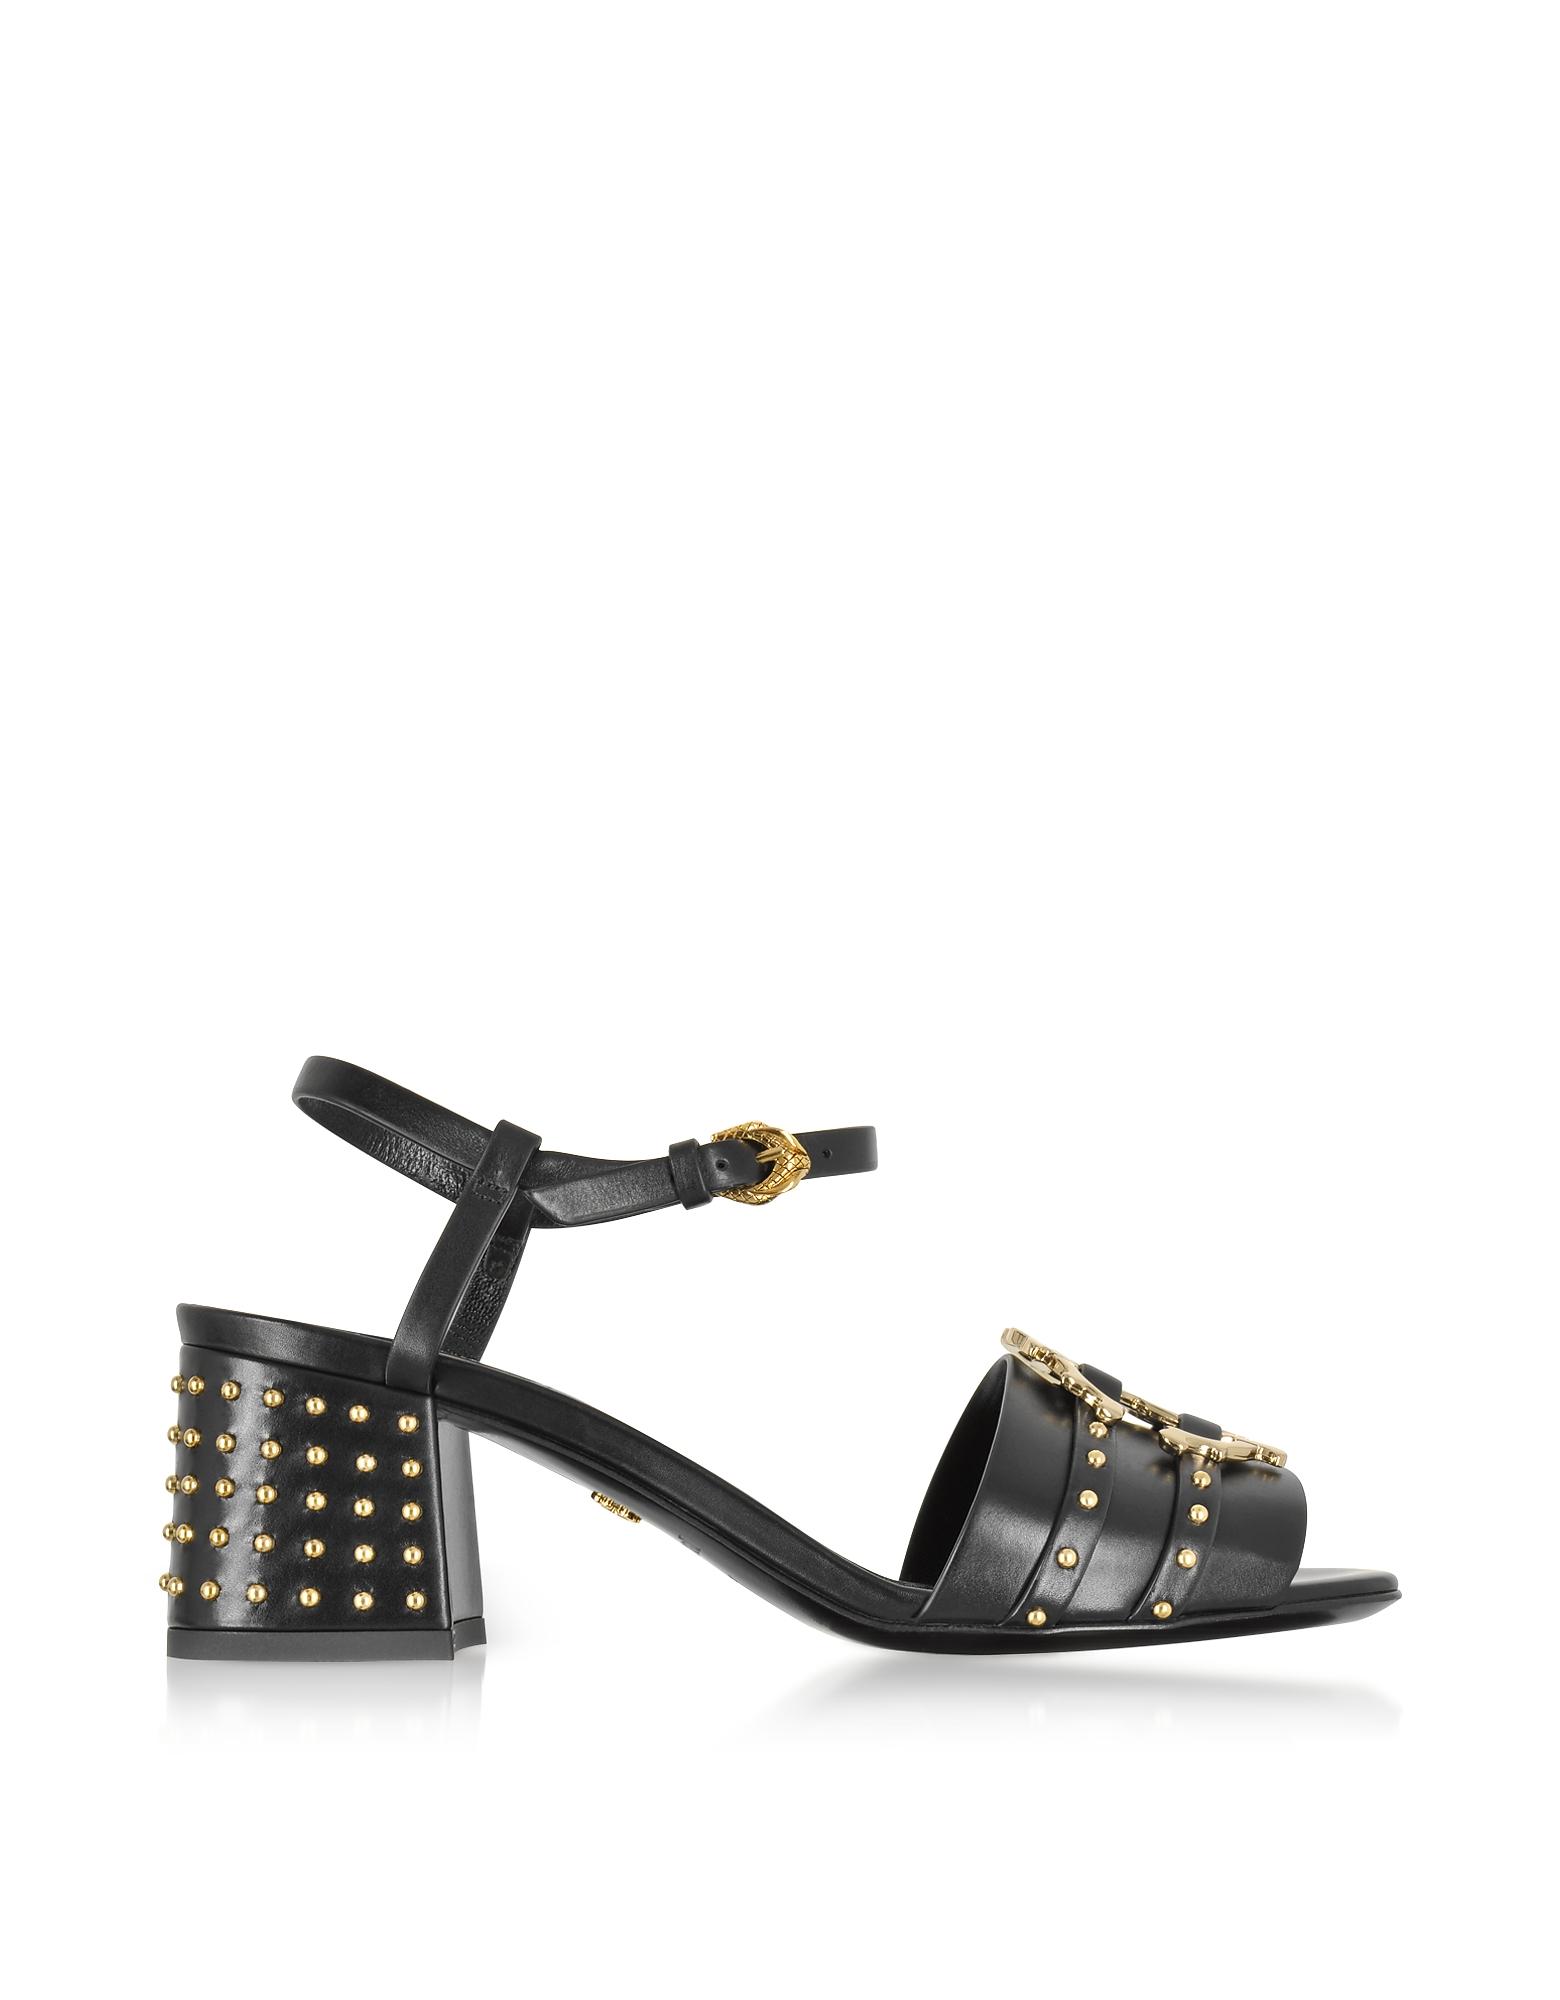 Roberto Cavalli Shoes, Black Leather Studded Sandals